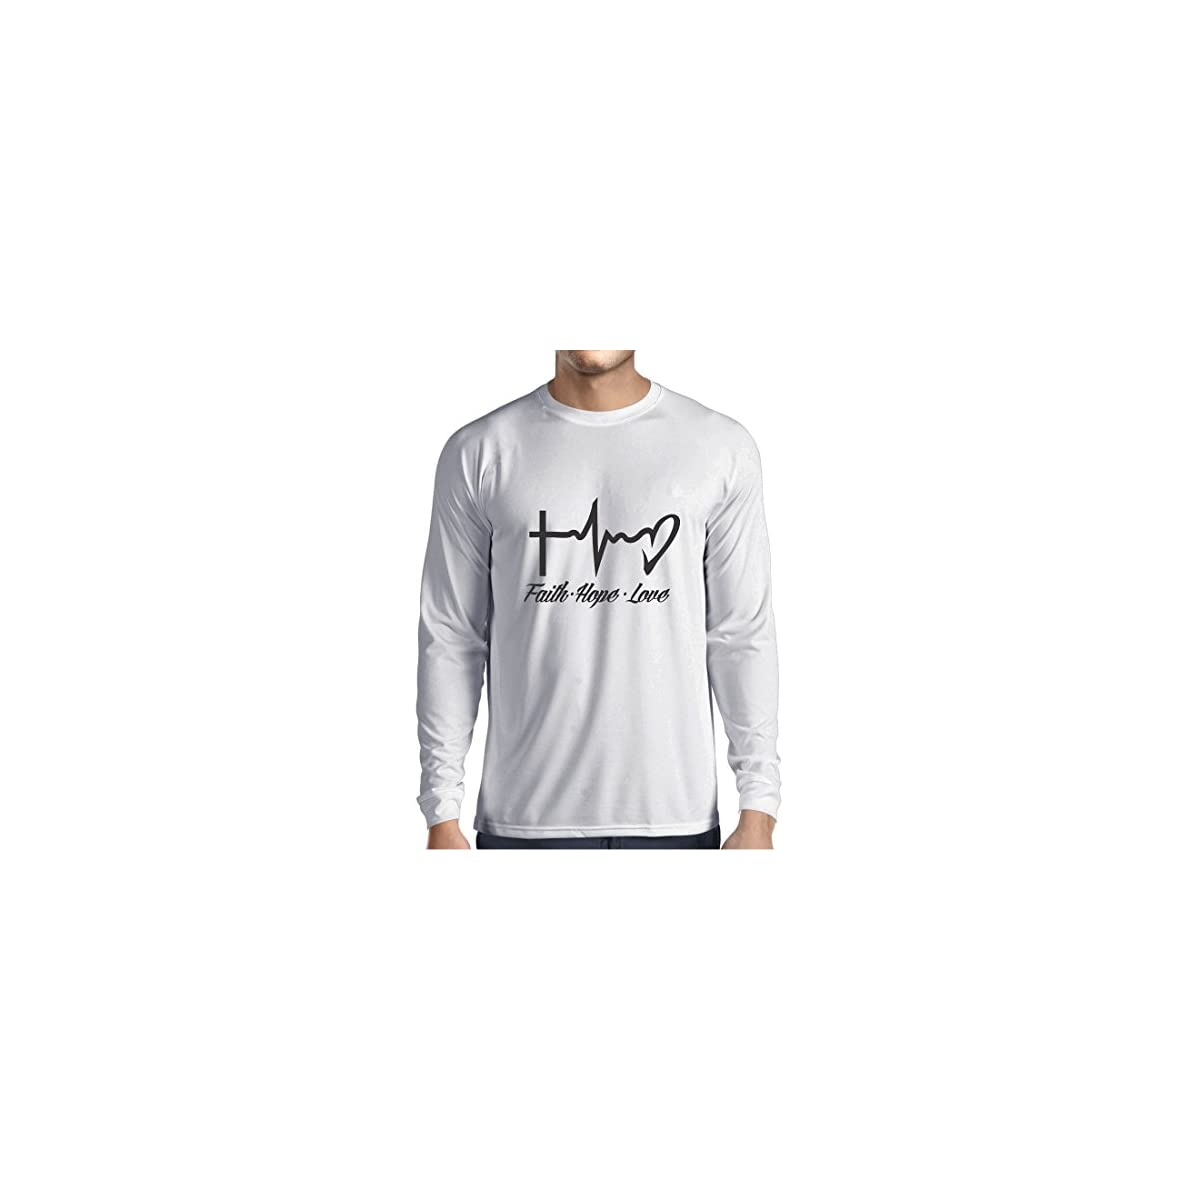 c63a7000c lepni.me Long Sleeve T Shirt Men Faith - Hope - Love - 1 Corinthians ...